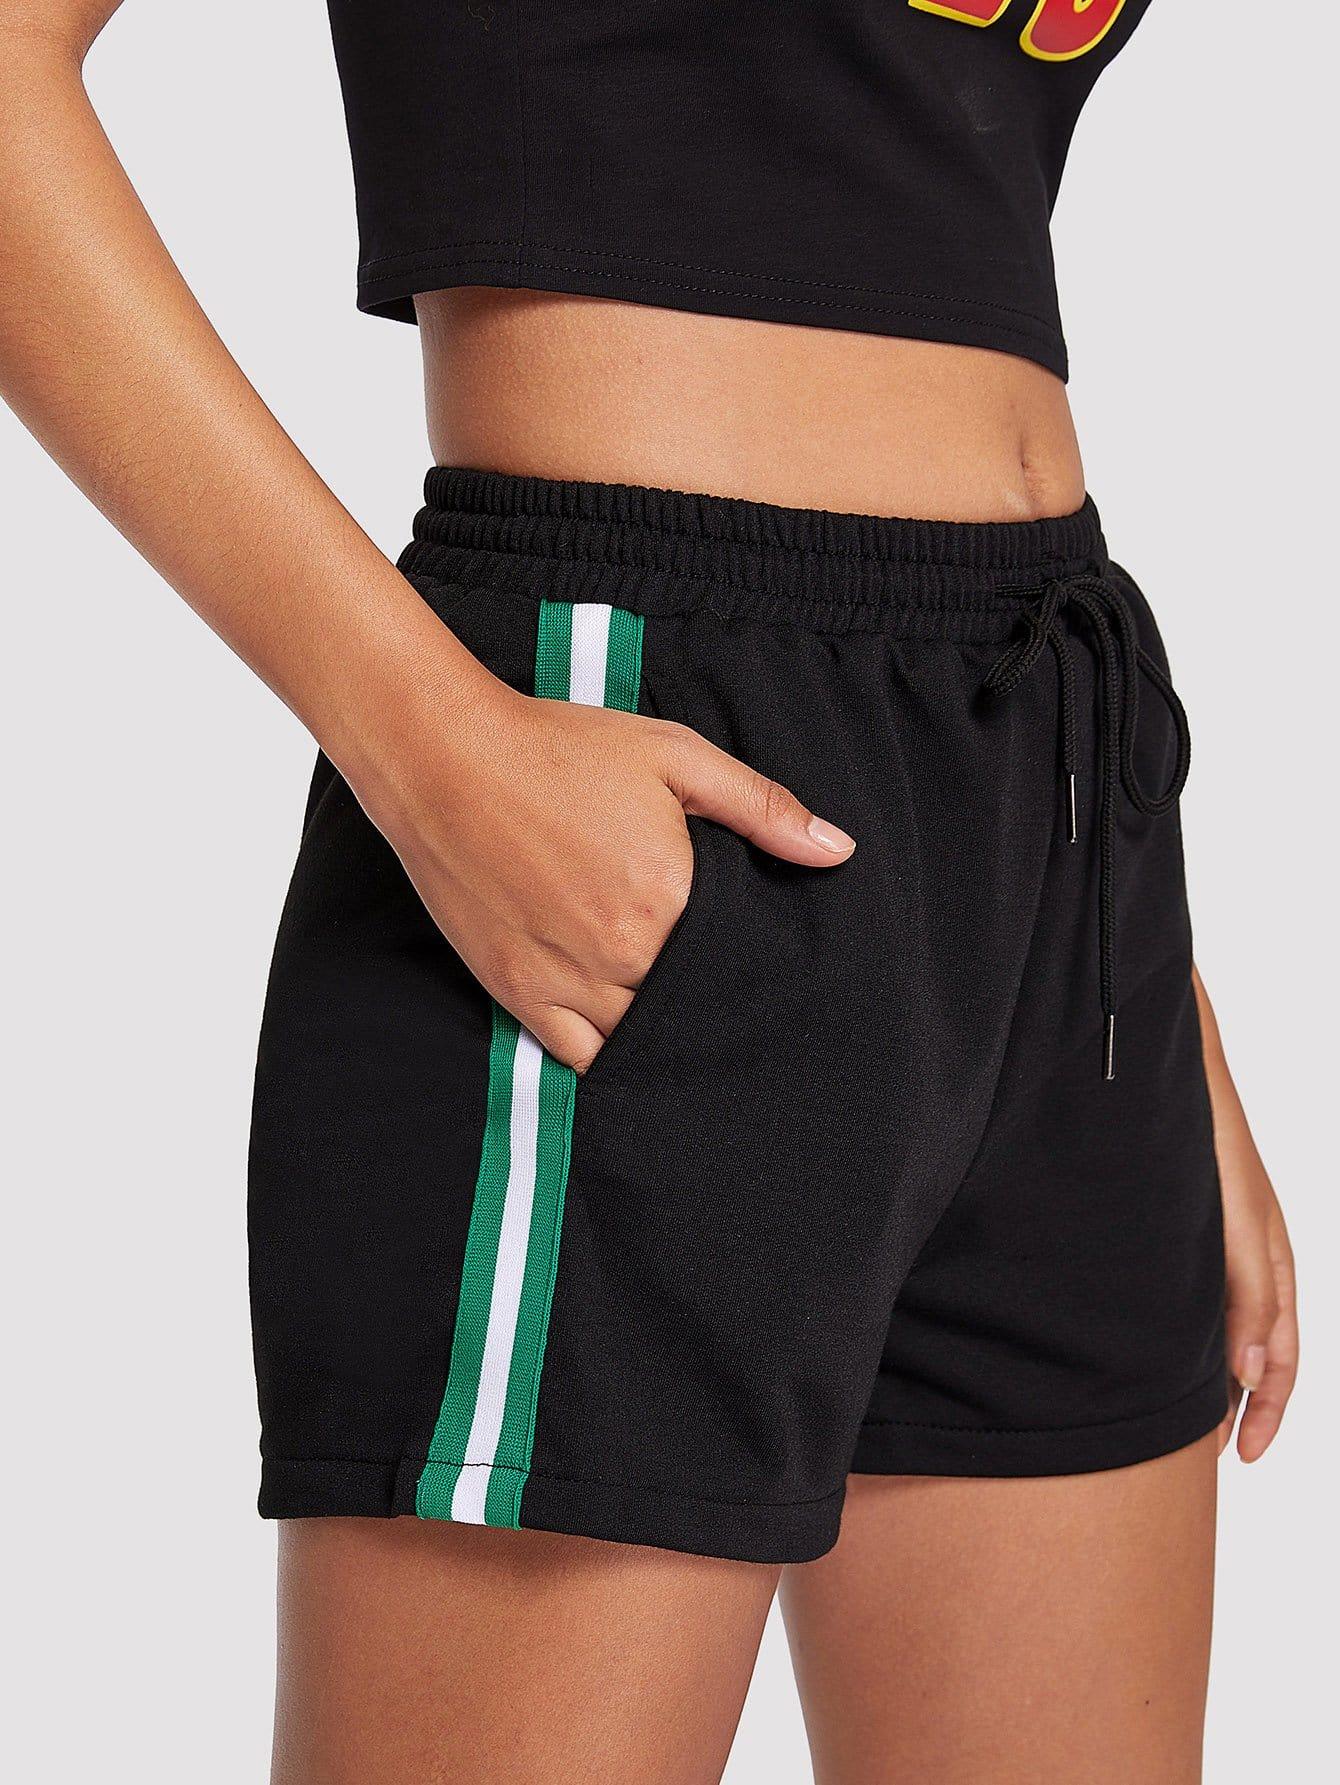 Striped Tape Side Drawstring Waist Shorts men striped tape side drawstring shorts